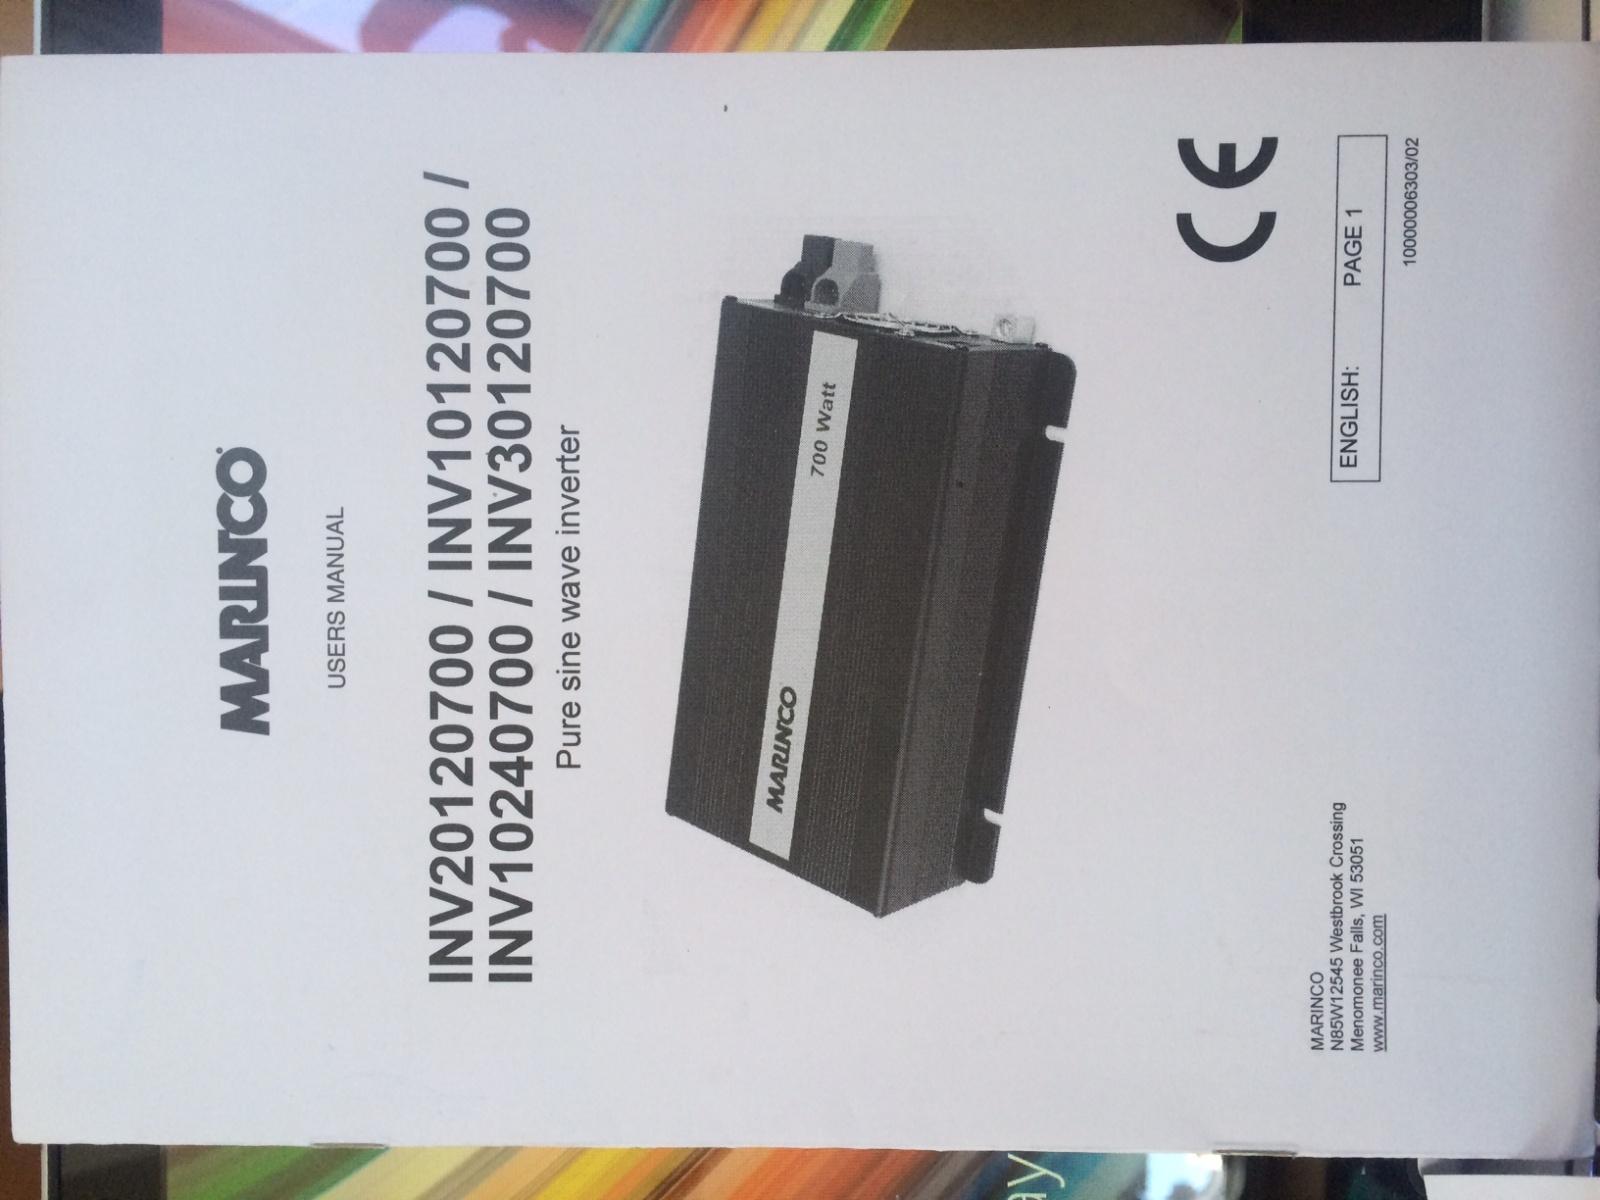 Click image for larger version  Name:Inverter Manual.jpg Views:132 Size:370.1 KB ID:99836